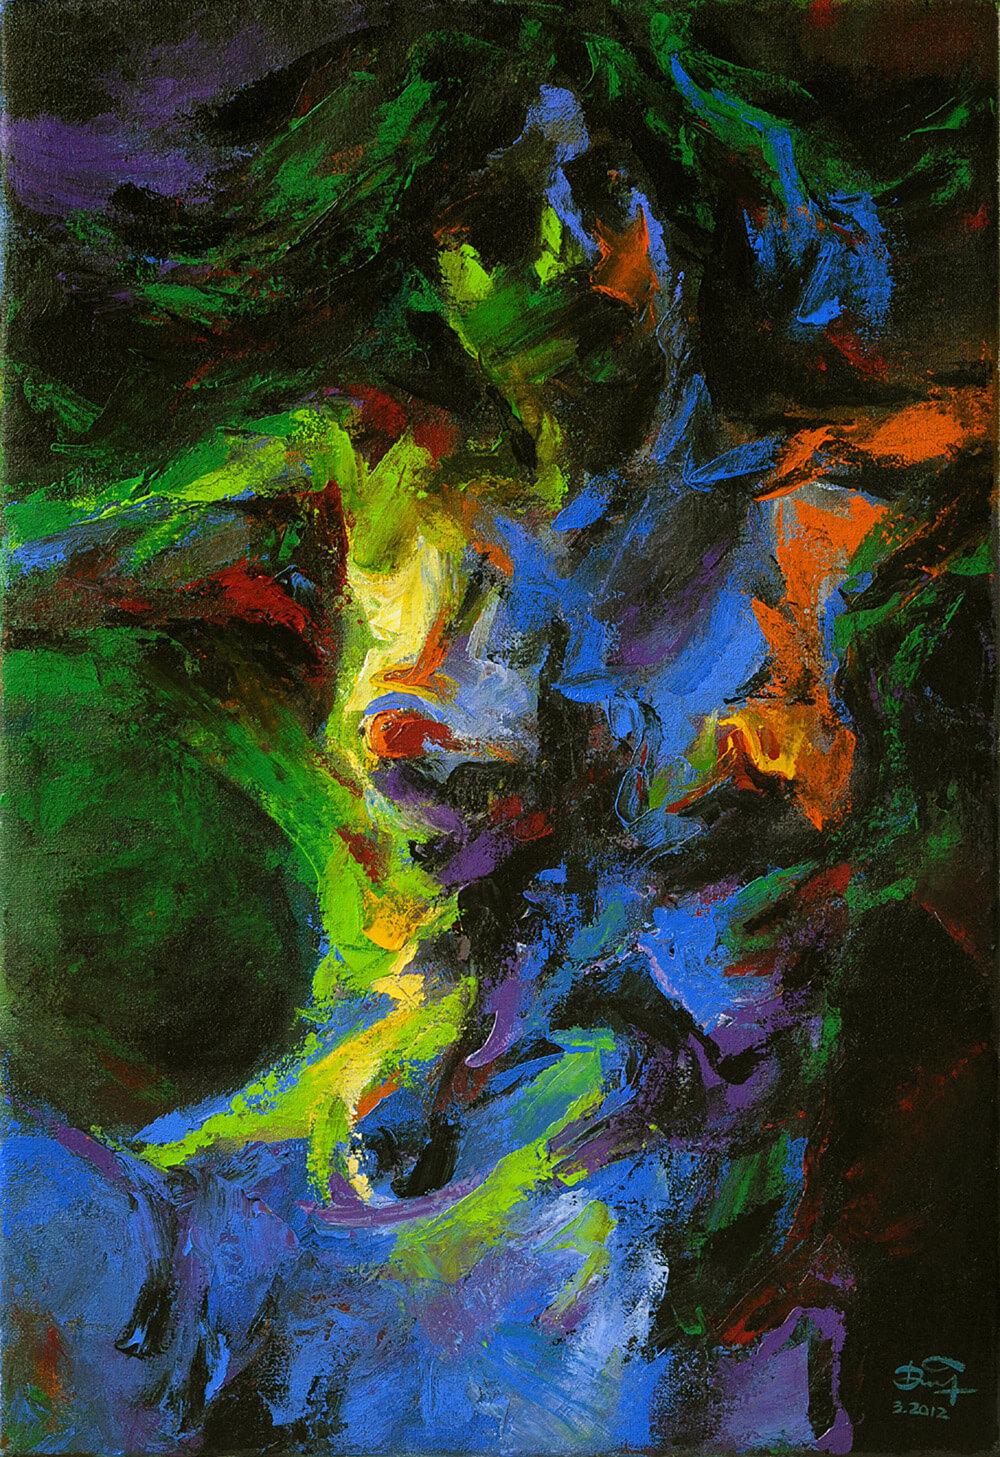 Nude-1, Vietnam Artworks